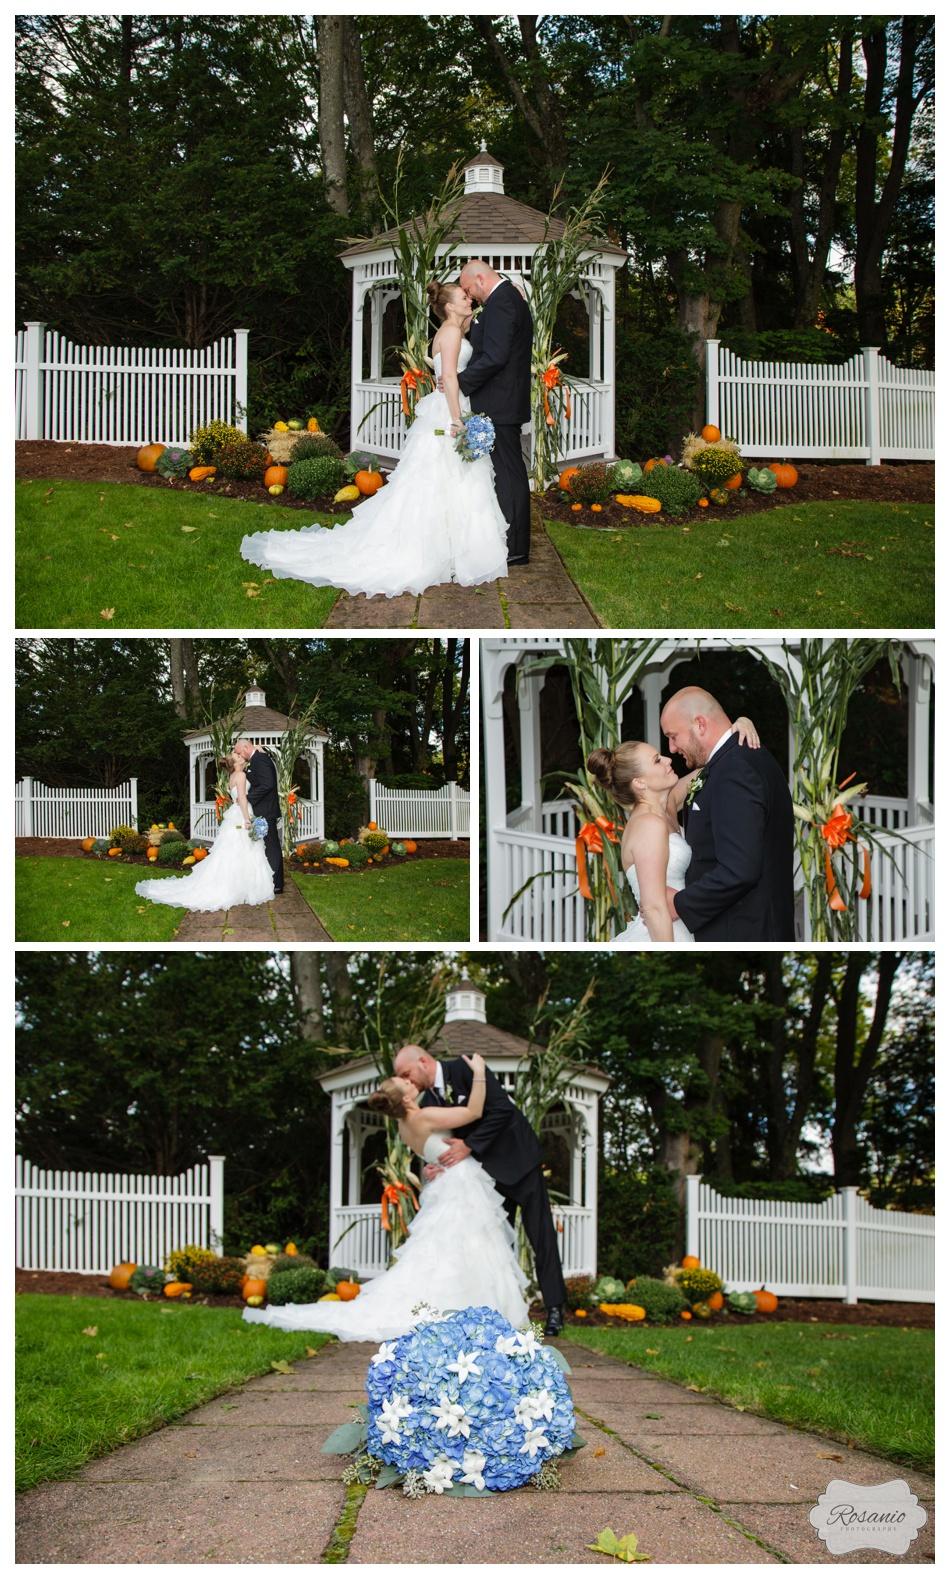 Rosanio Photography | Diburro's Haverhill MA | Massachusetts Wedding Photographer_0069.jpg